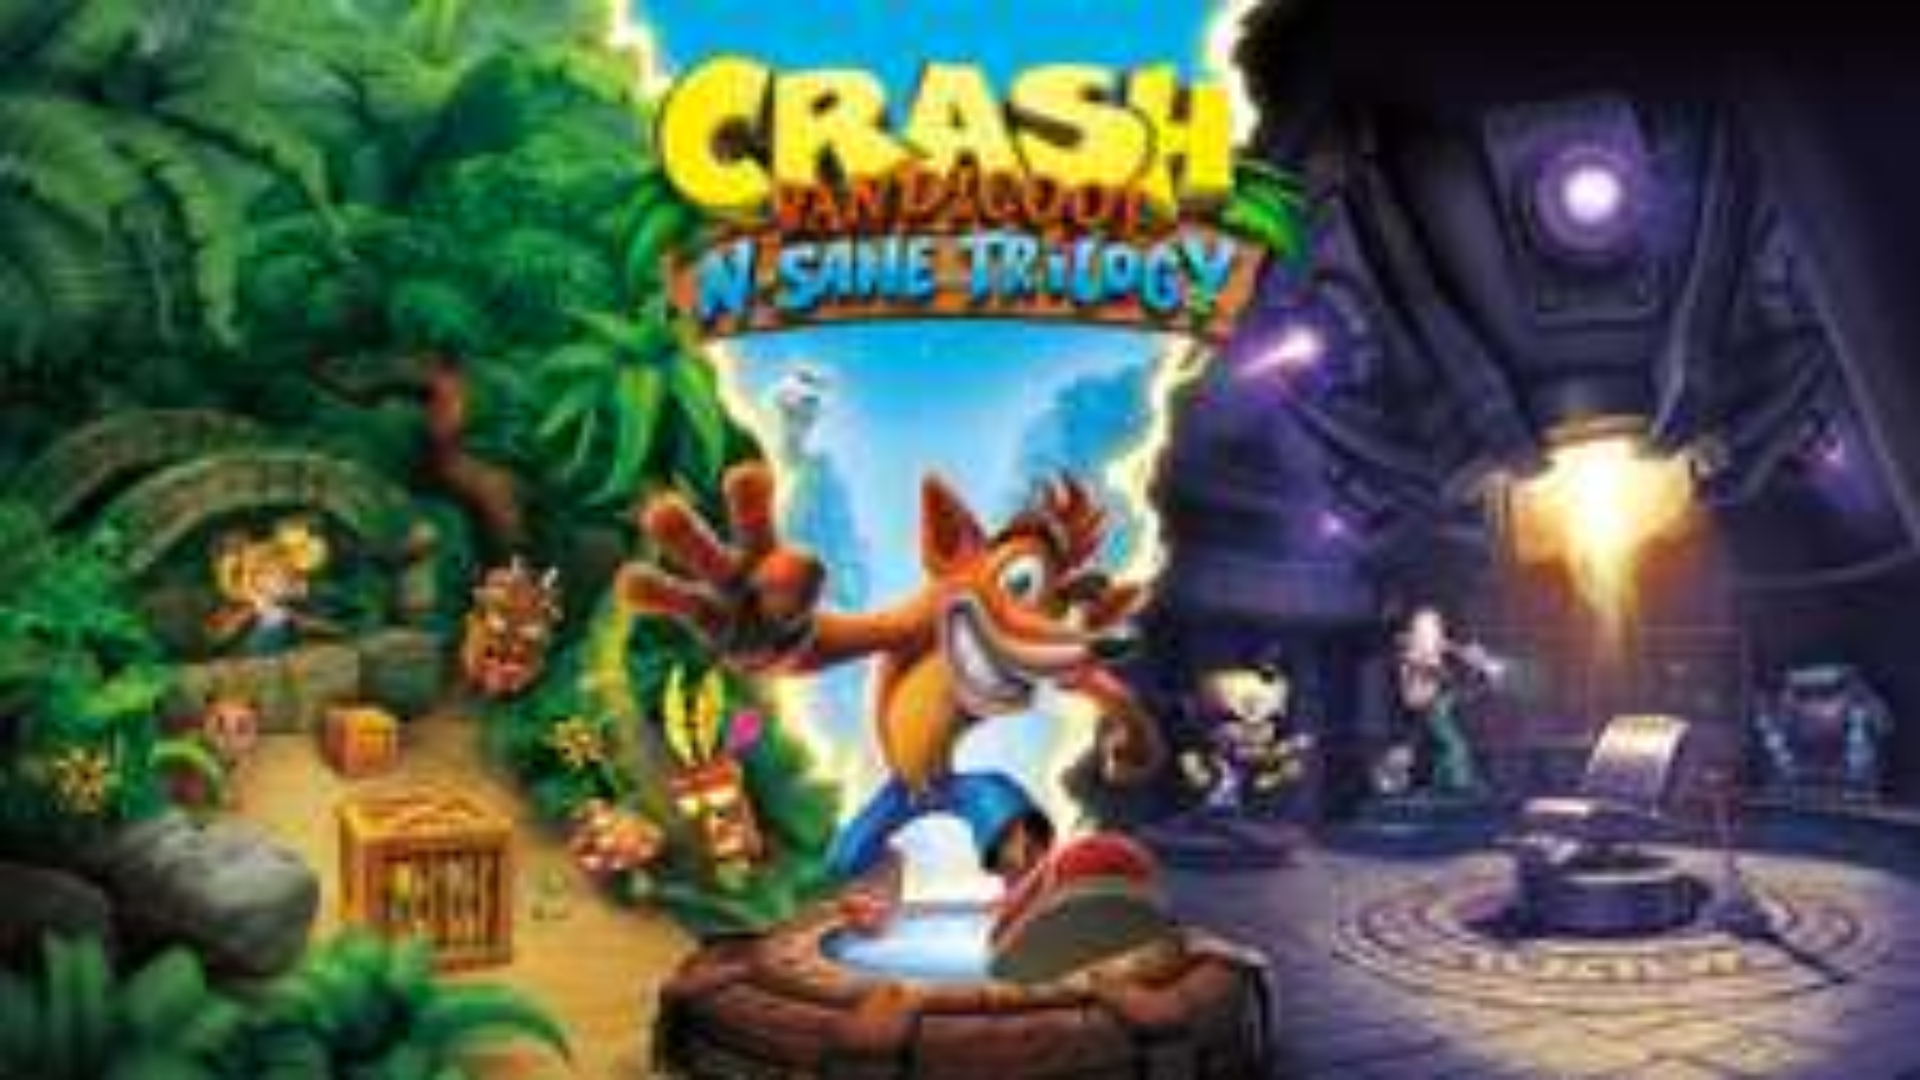 Nintendo, Oferta de crash nsane trilogy en la e-shop -50%